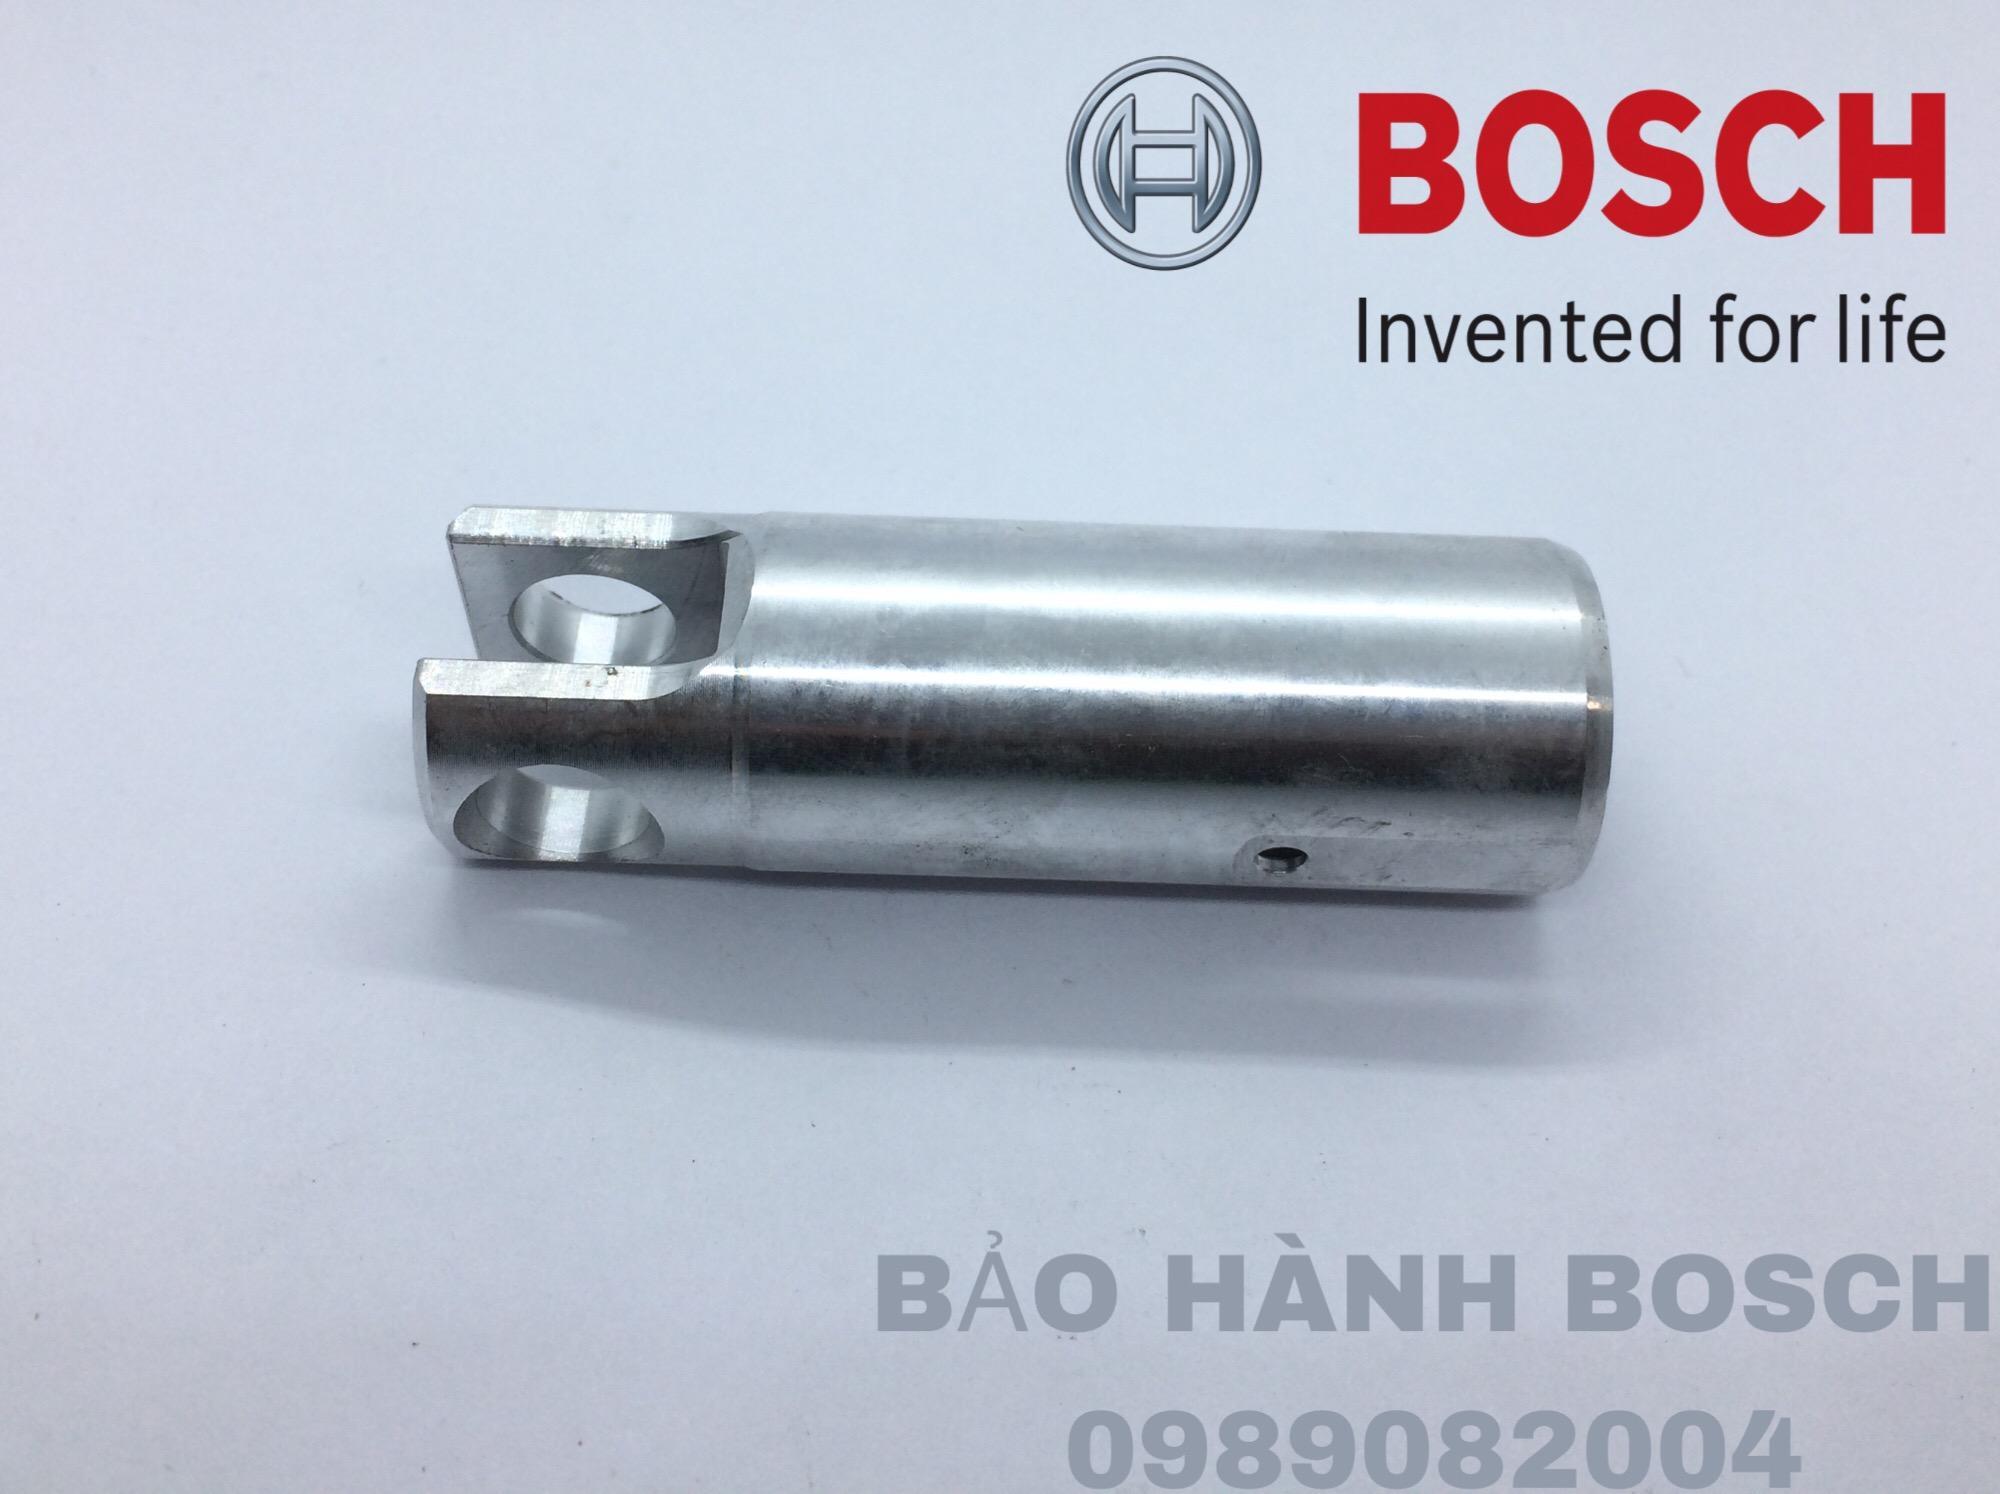 Bán Gbh 2 20 Piston Bosch Rẻ